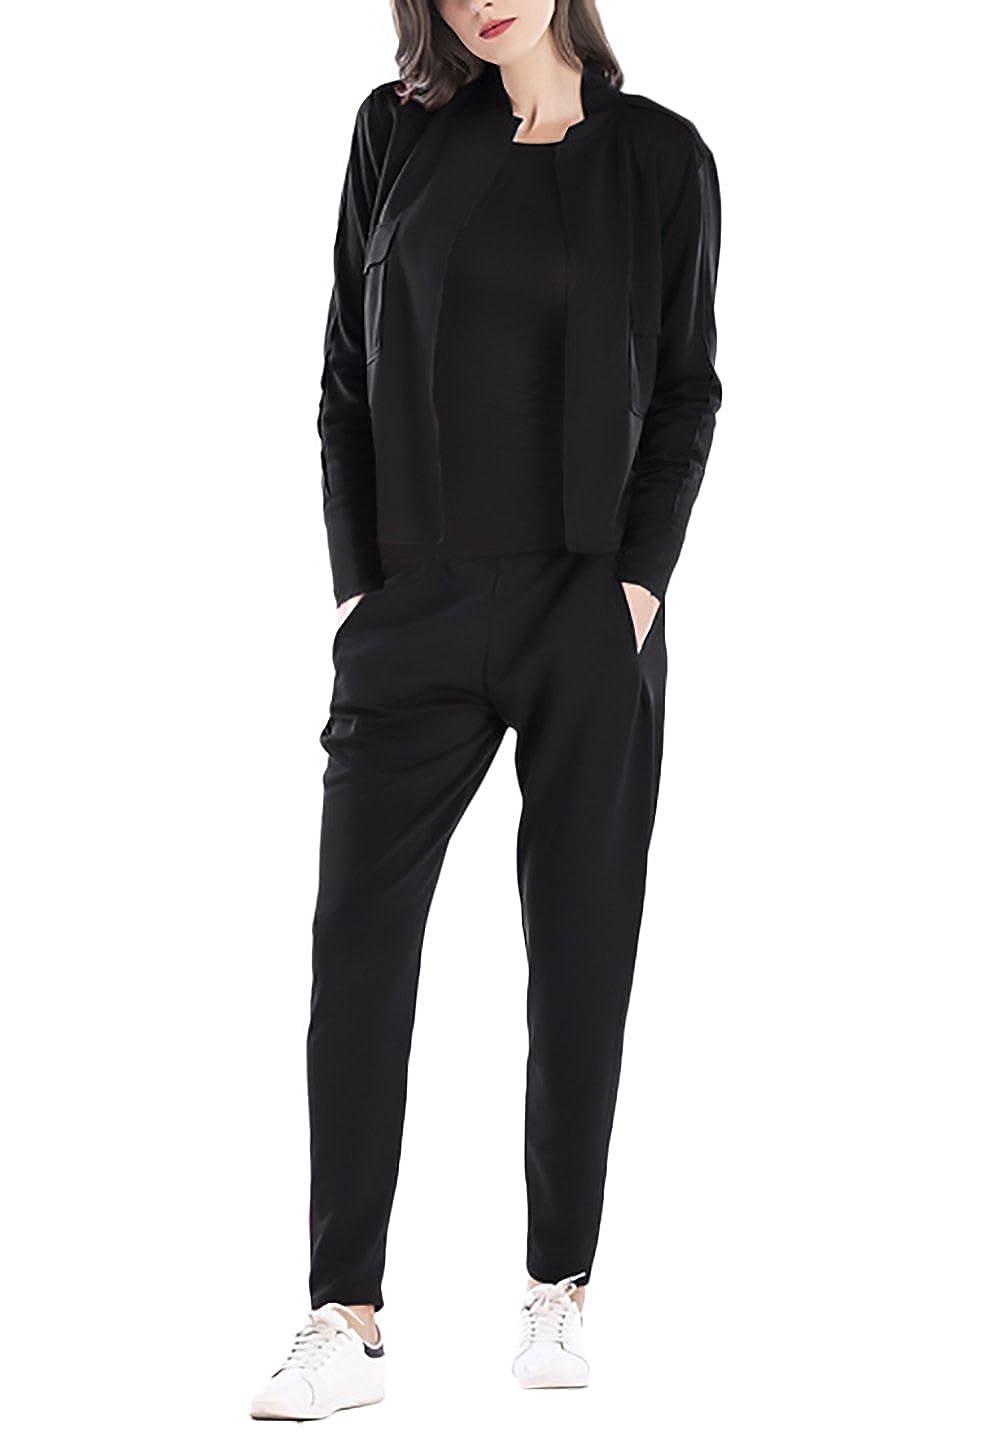 Donna Giacca Und Pantaloni 2 Pezzi Tuta Manica Lunga Slim Fit Elegante Vintage Fashion Casual Autunno Inverno Sportivo Set Giacche Blazer Bolero Outwear Pantalone Trousers HX fashion